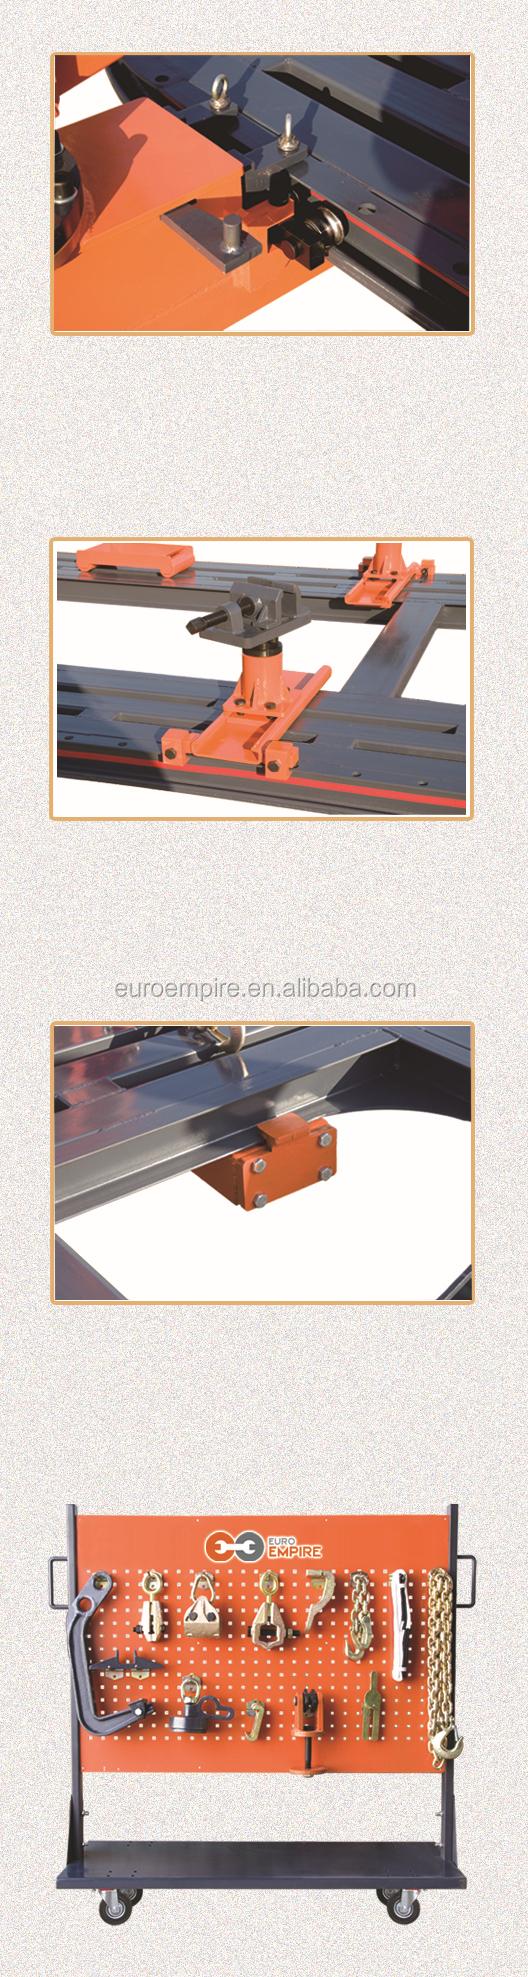 China Supplier Design Auto Repair Workshop/car Body Collision ...